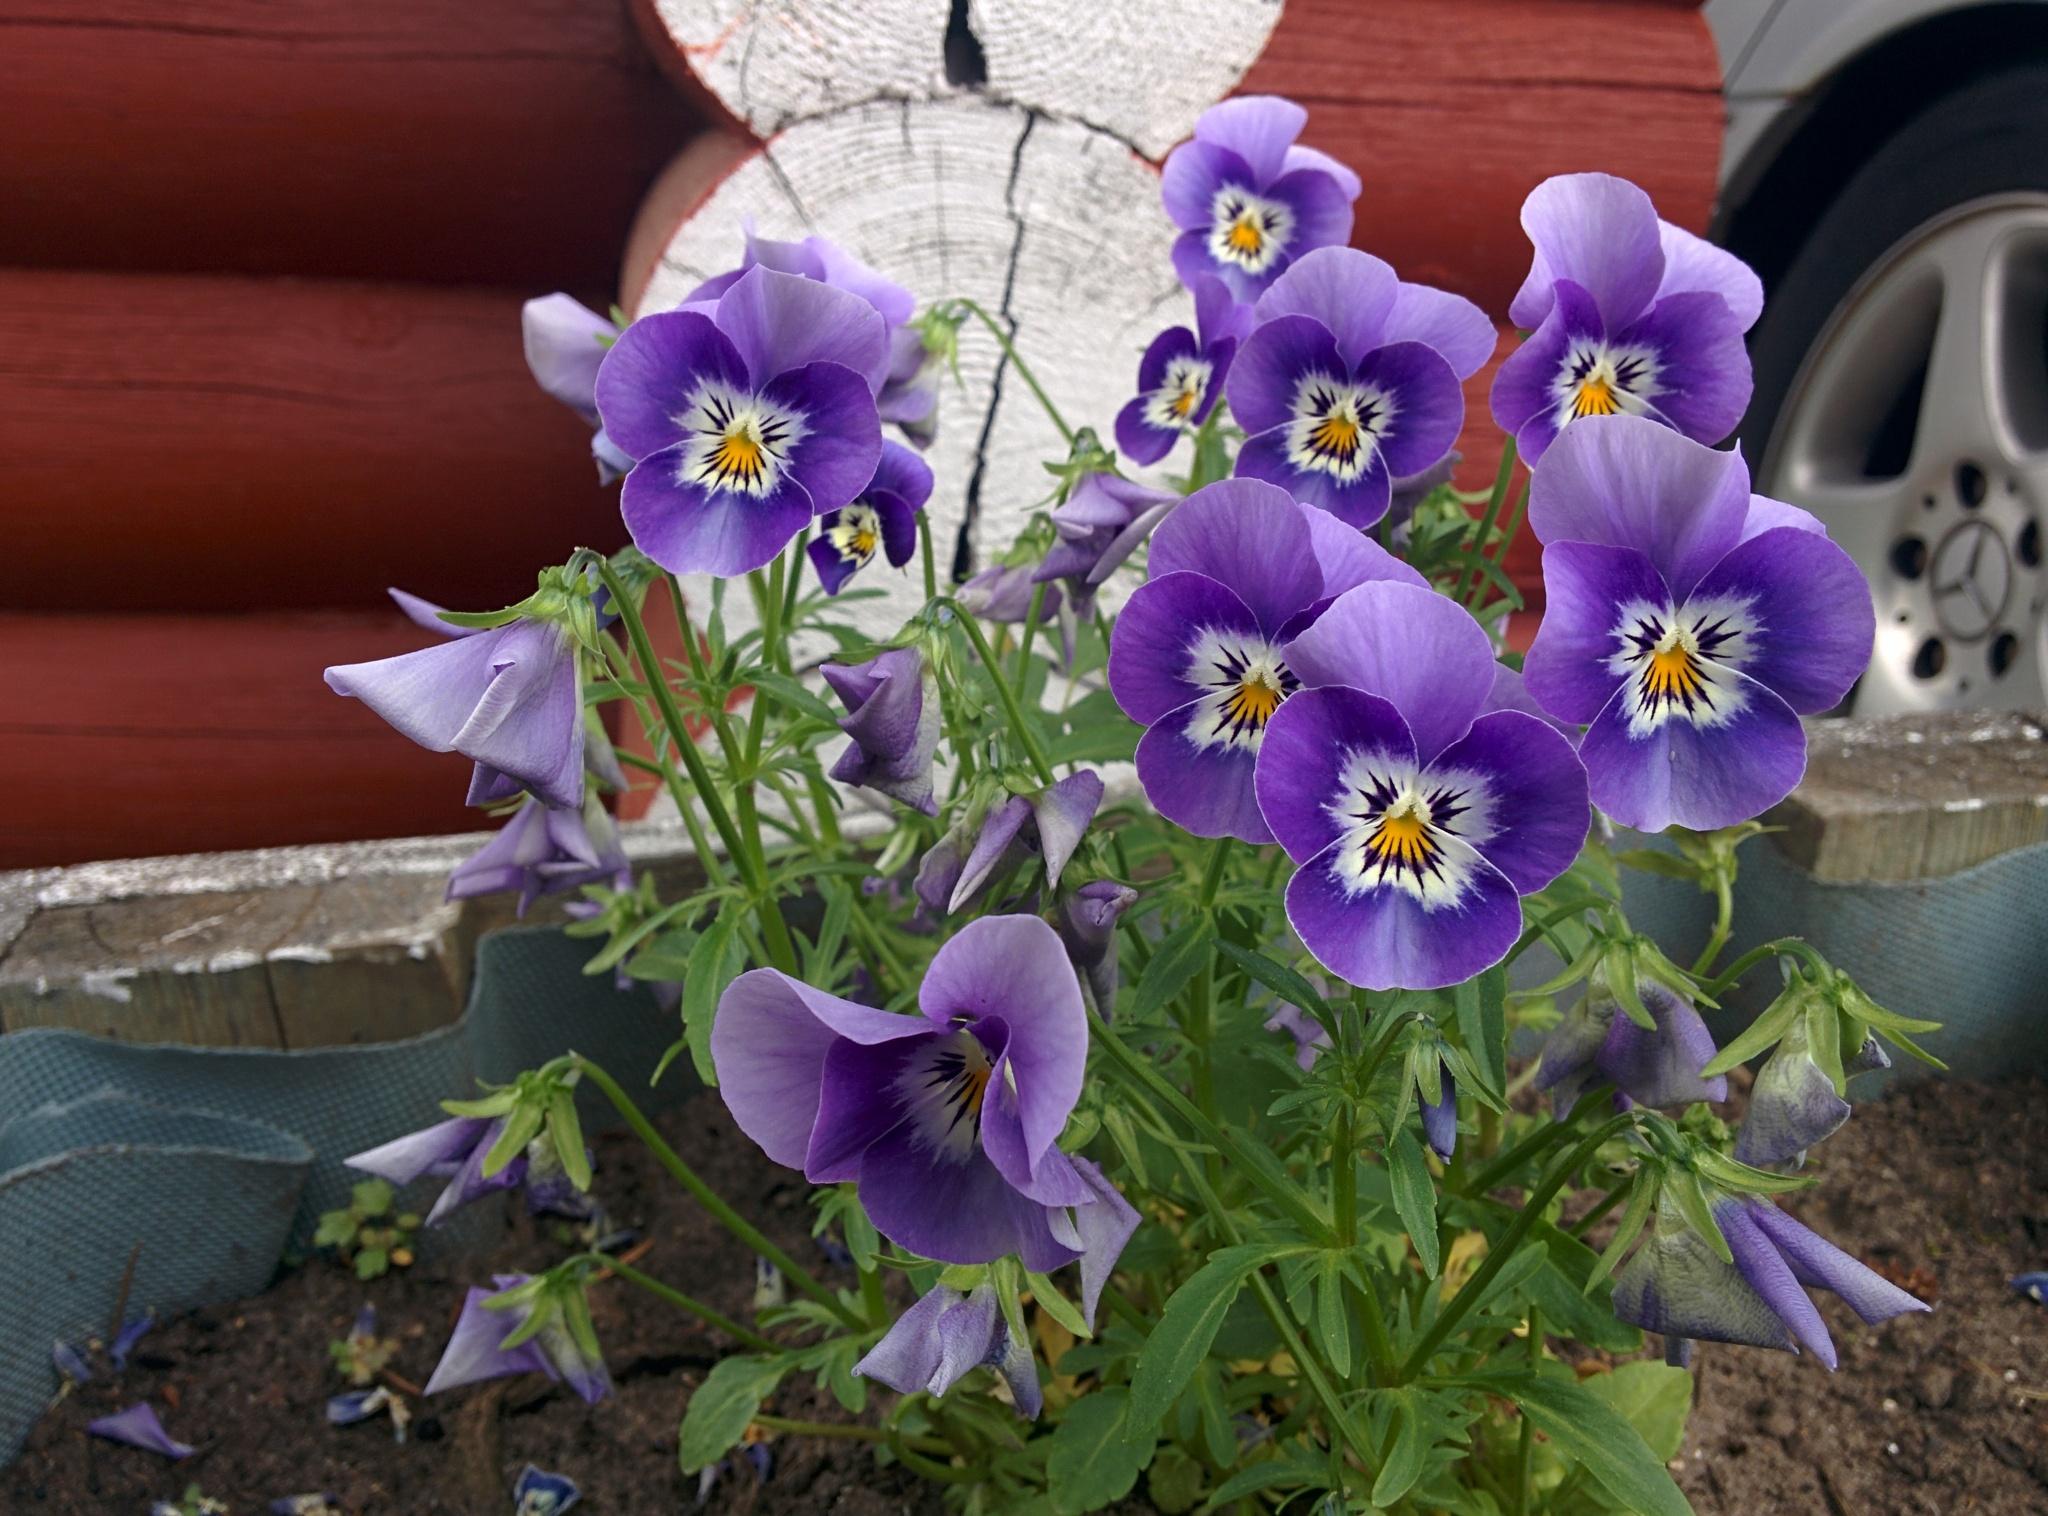 Angry flowers by Mia Teglia